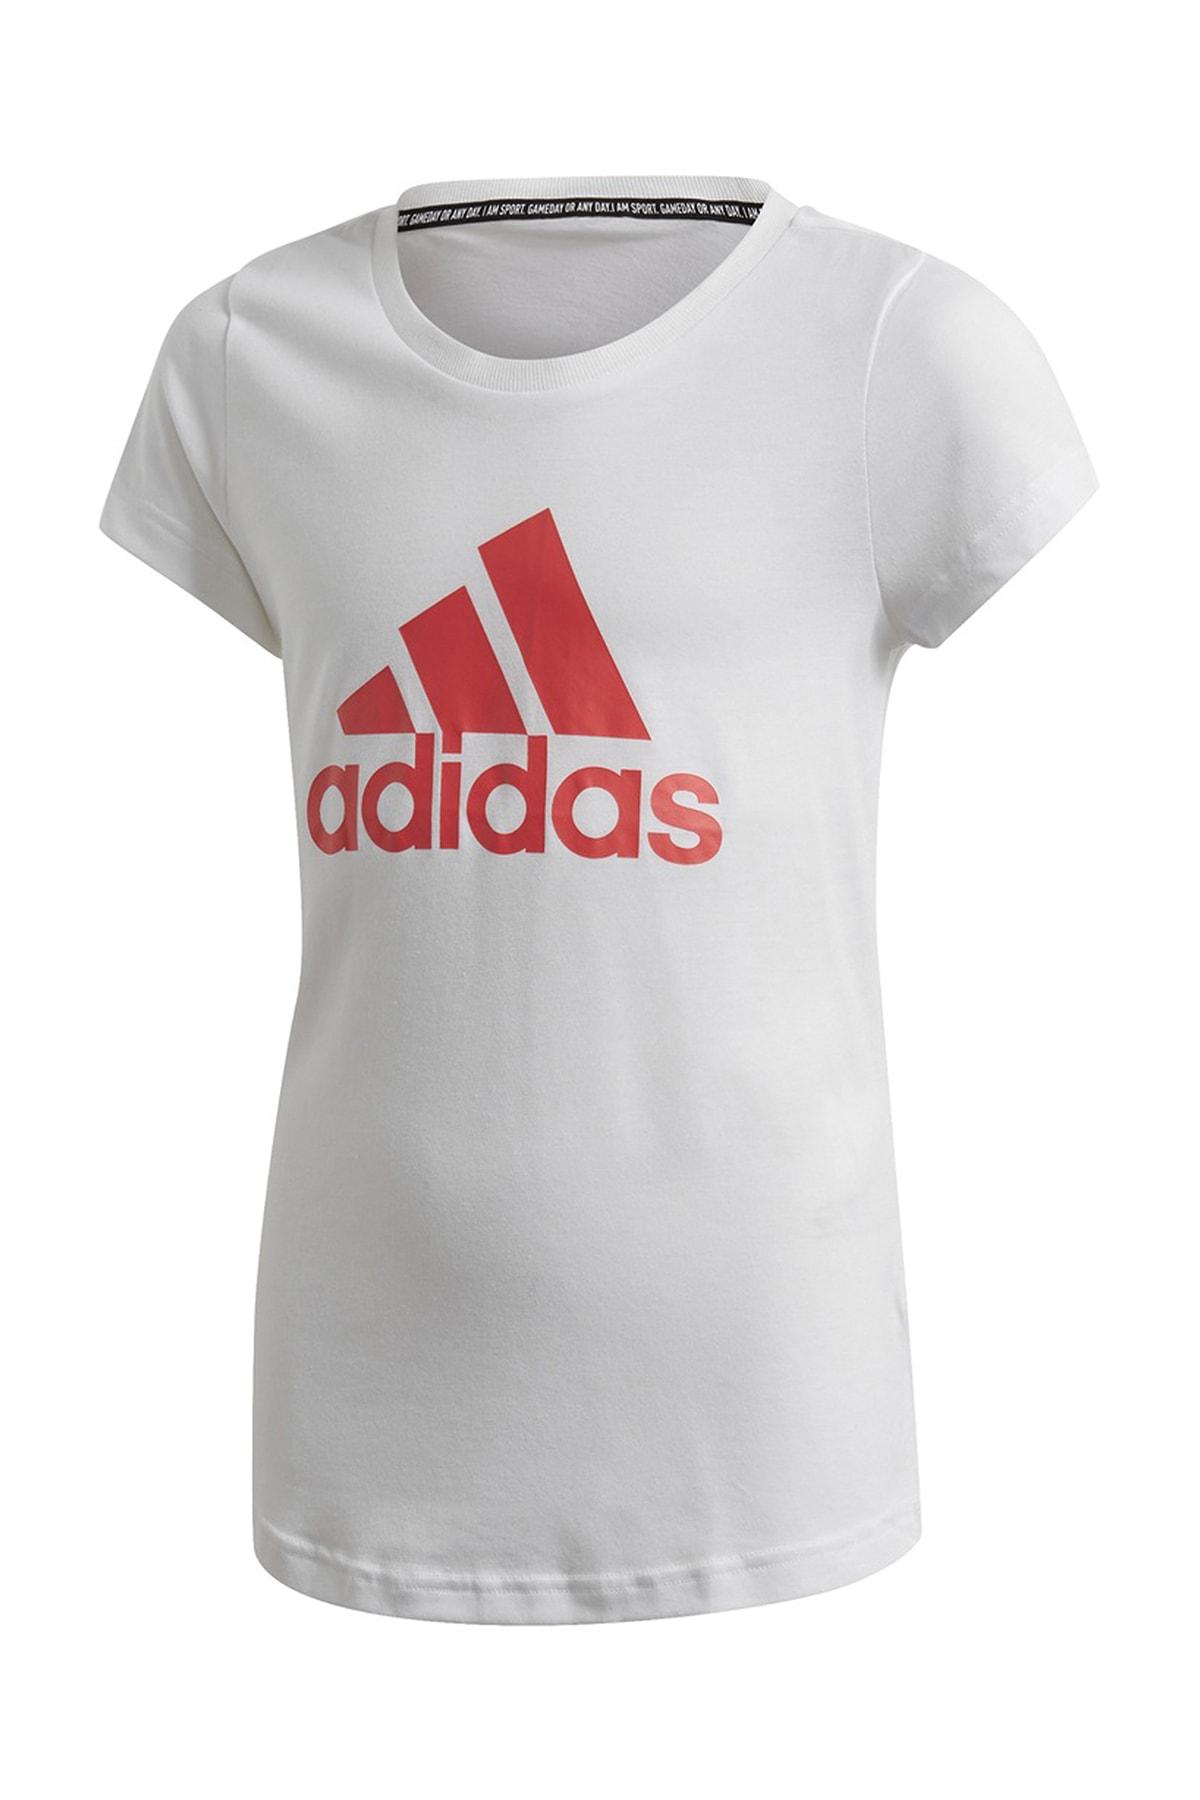 adidas FM6509-C adidas Yg Mh Bos Tee Çocuk T-Shirt Beyaz